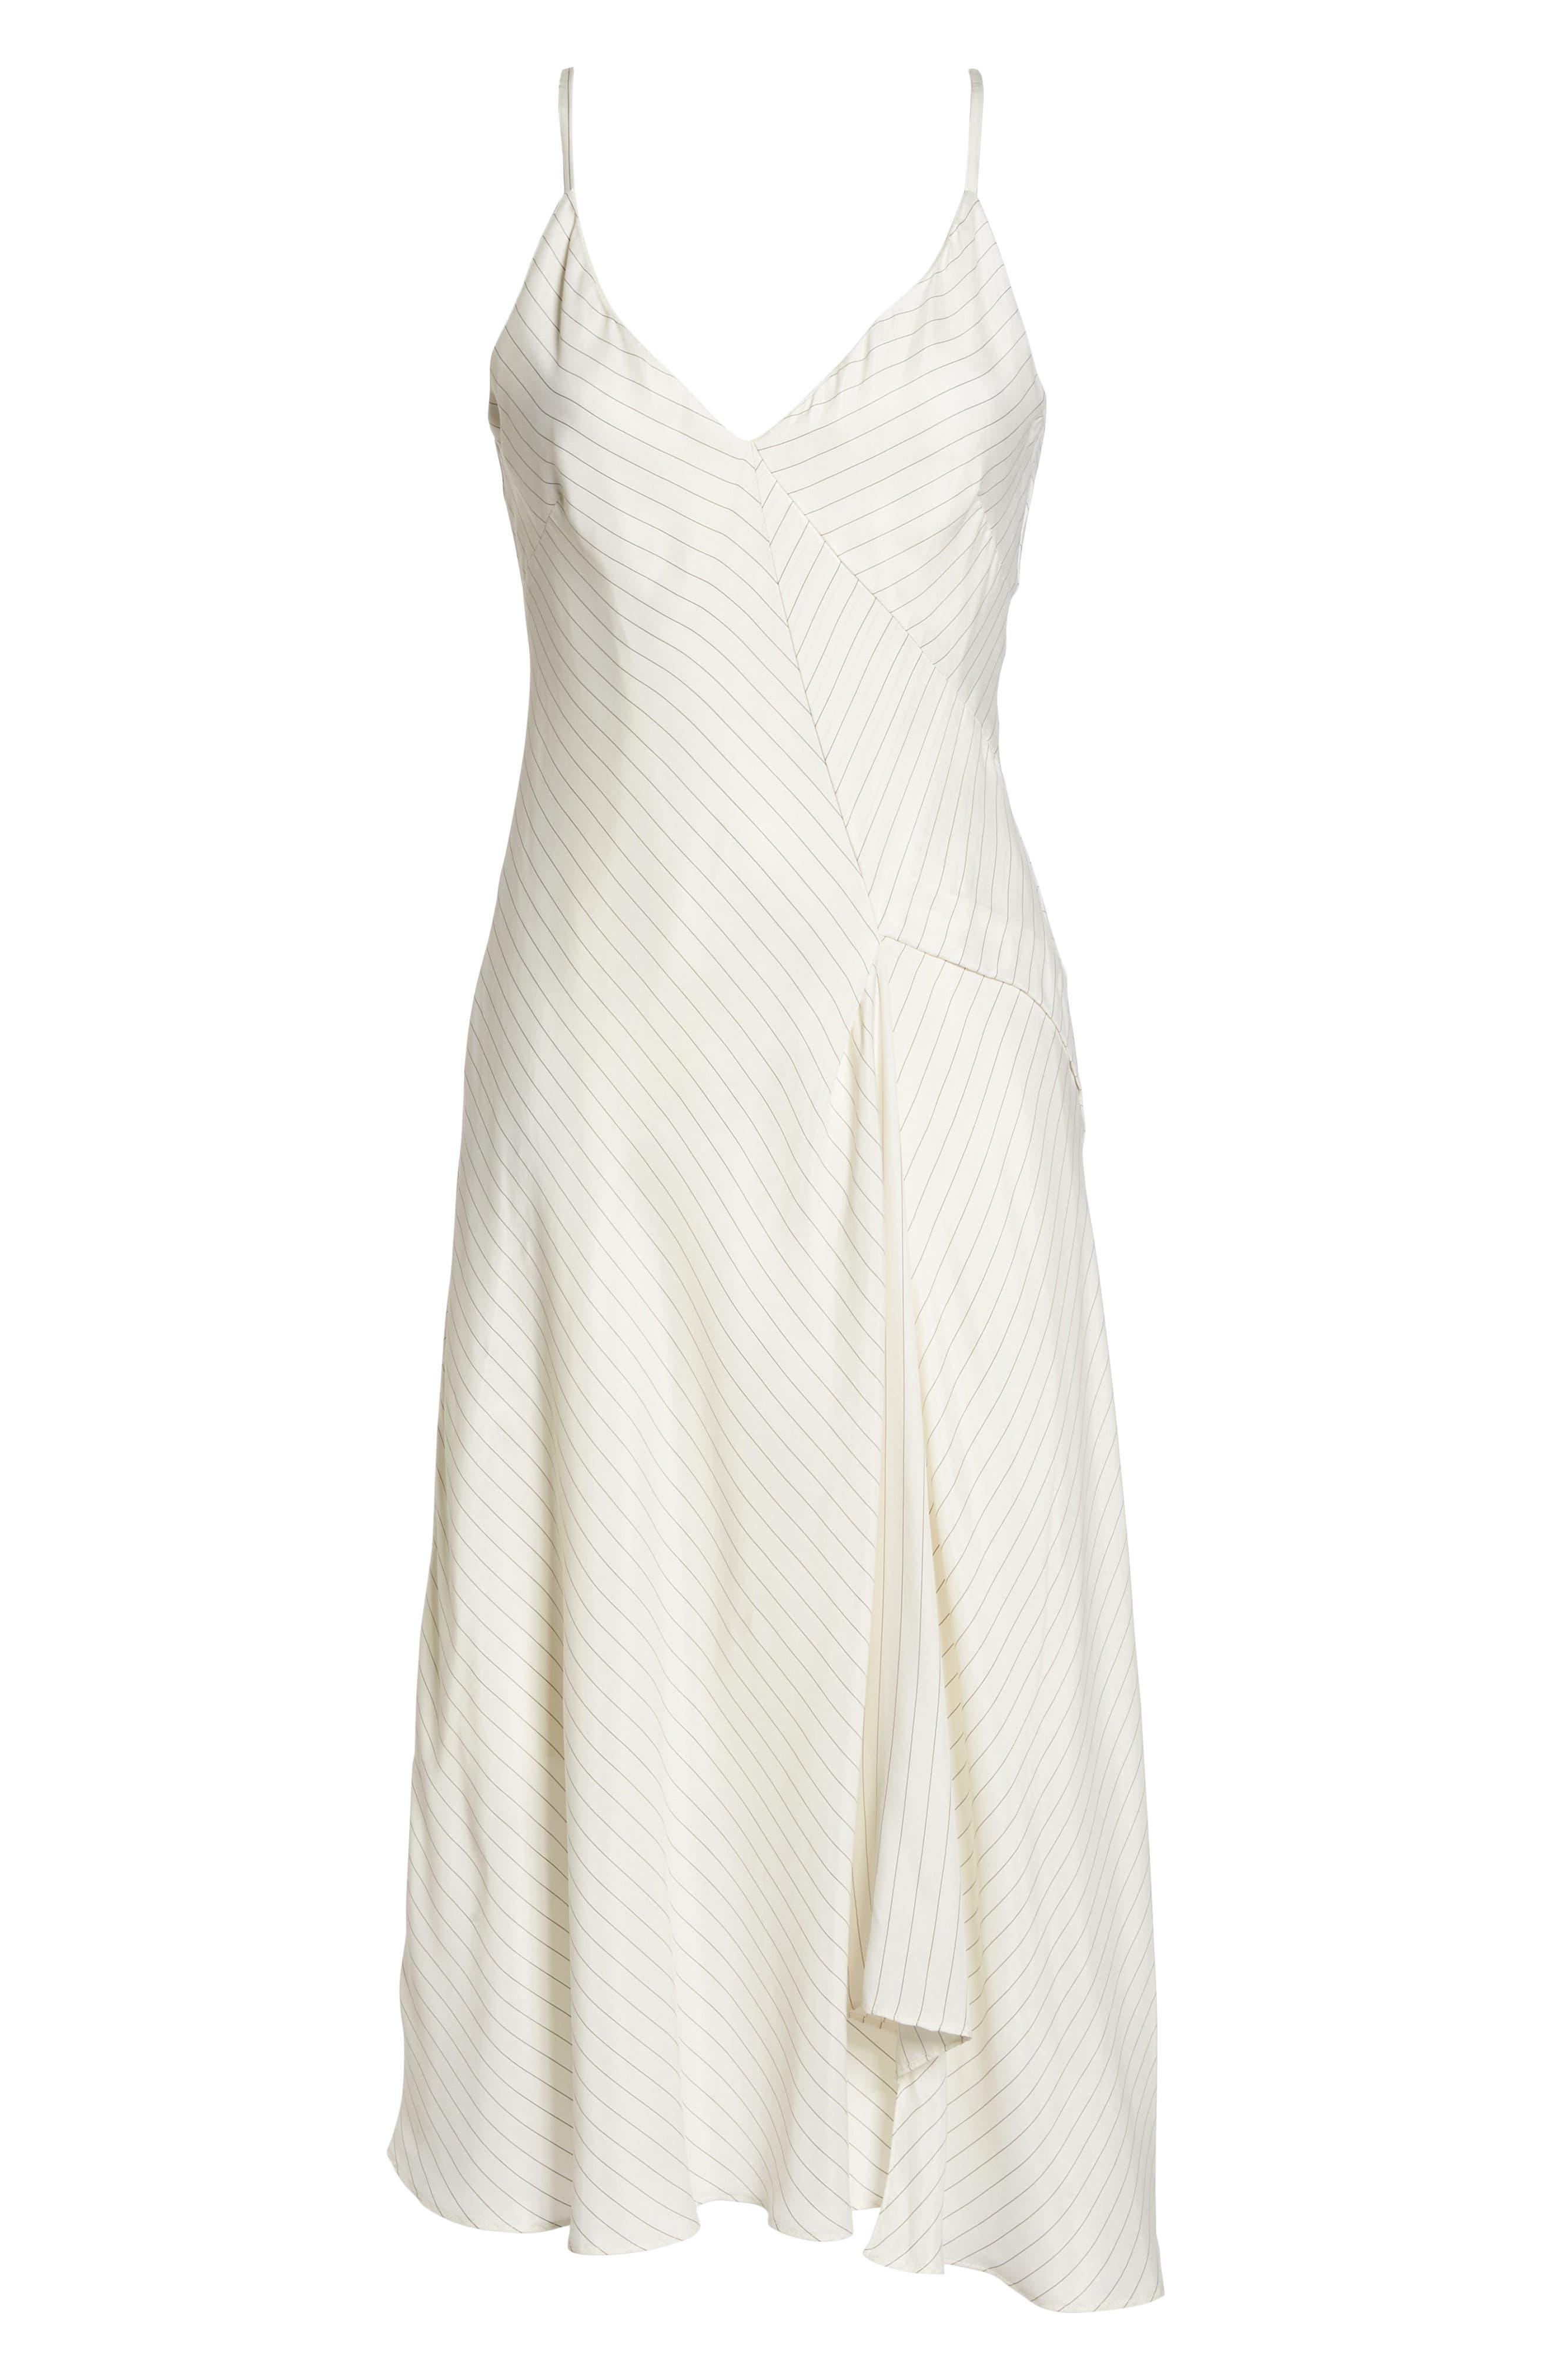 Bay Area Pinstripe Asymmetric Midi Dress,                             Alternate thumbnail 7, color,                             Cream